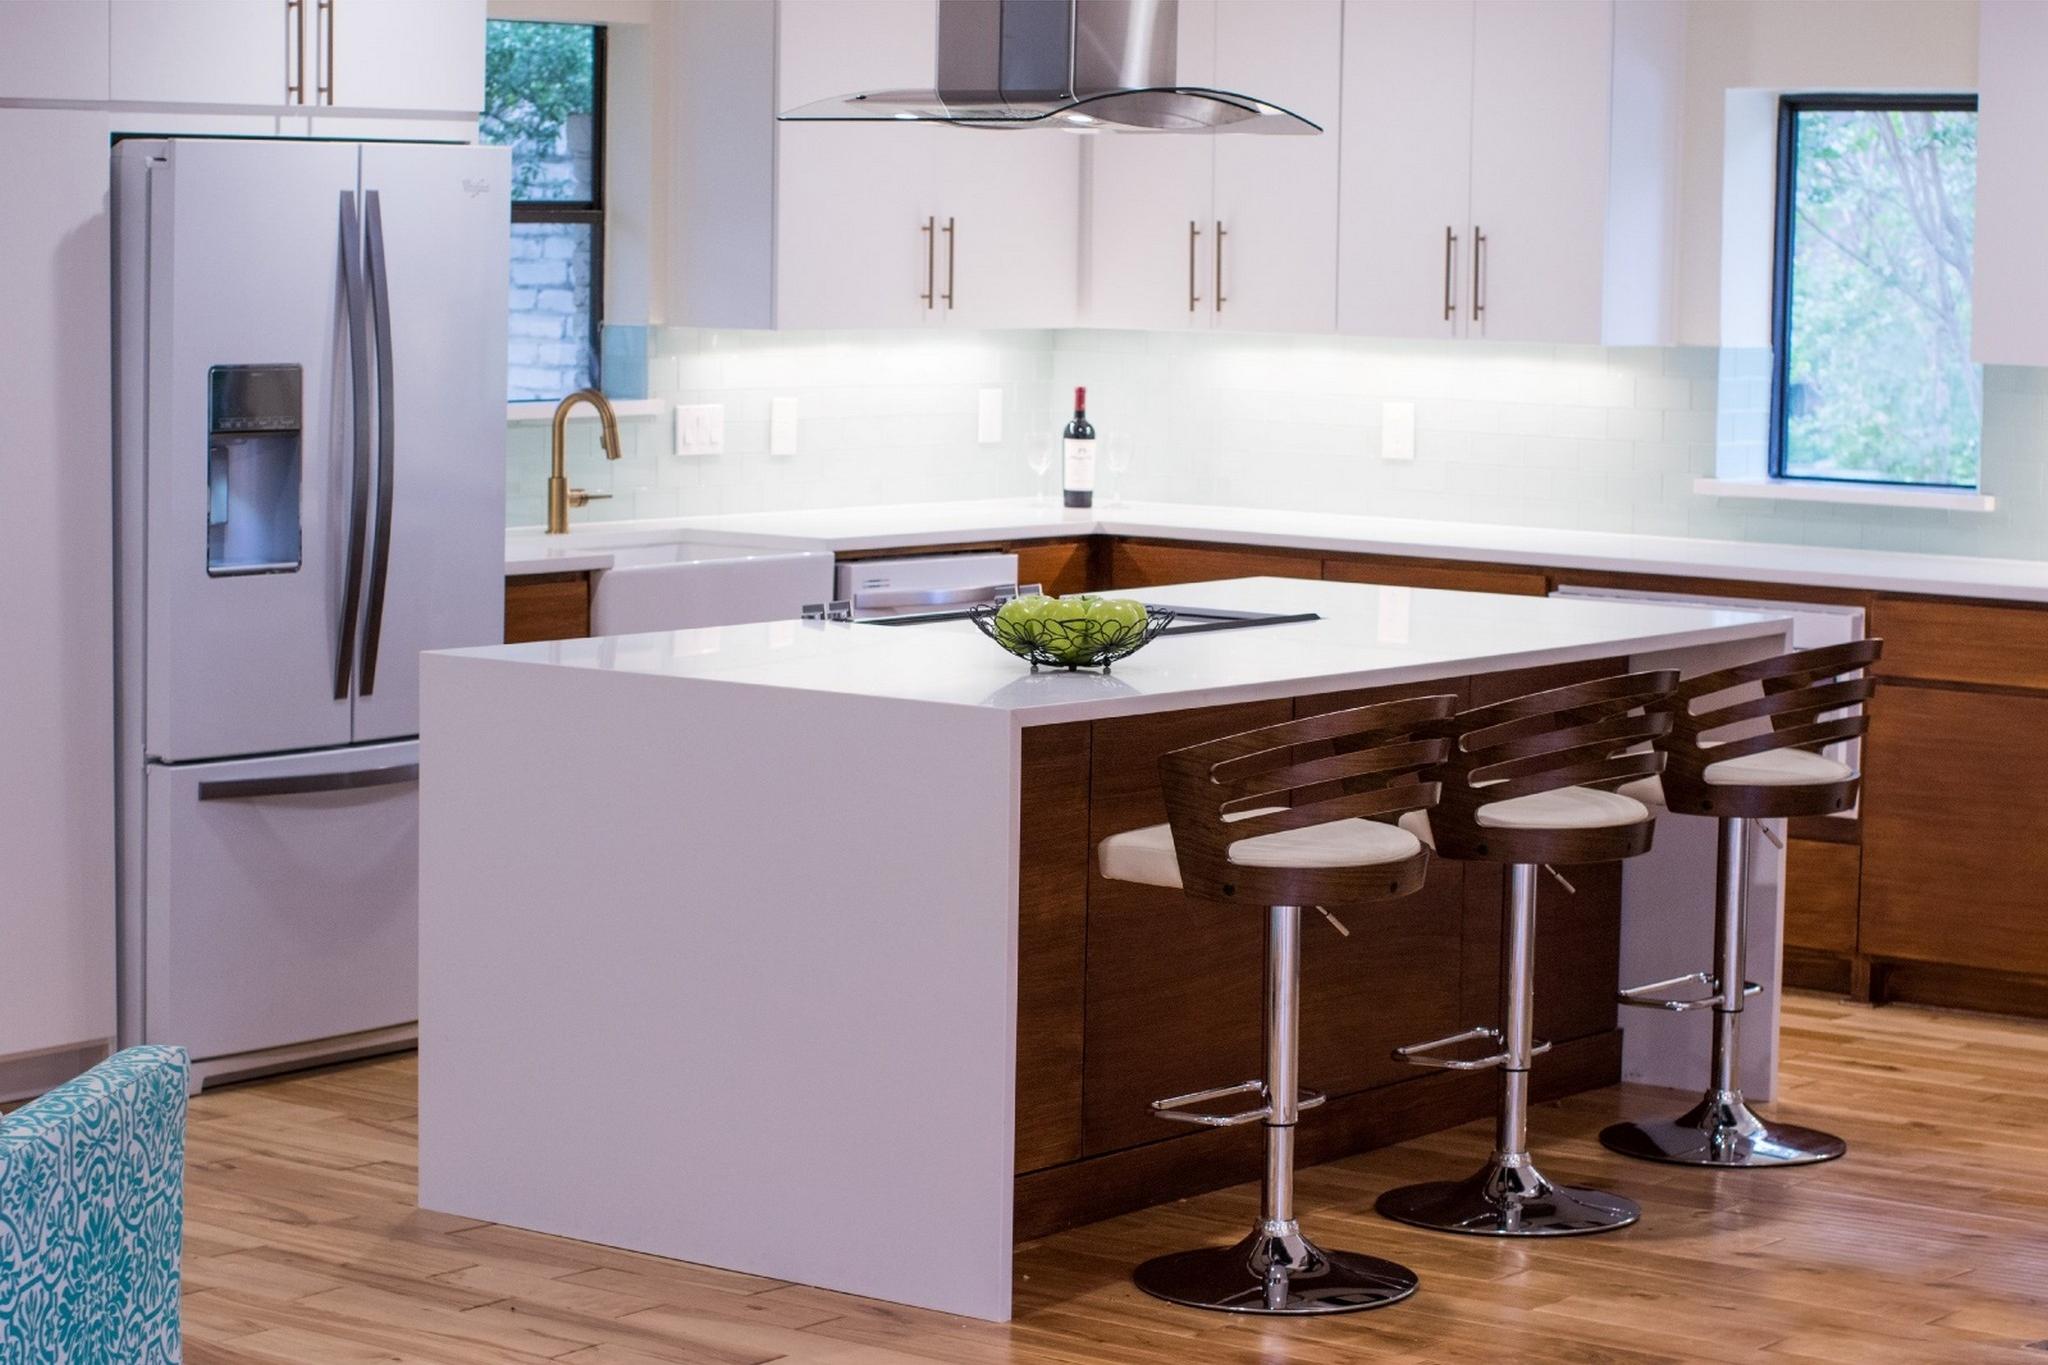 Prestonwood- Dallas-TX-75248-Kitchen-After-Remodeling-pics 17